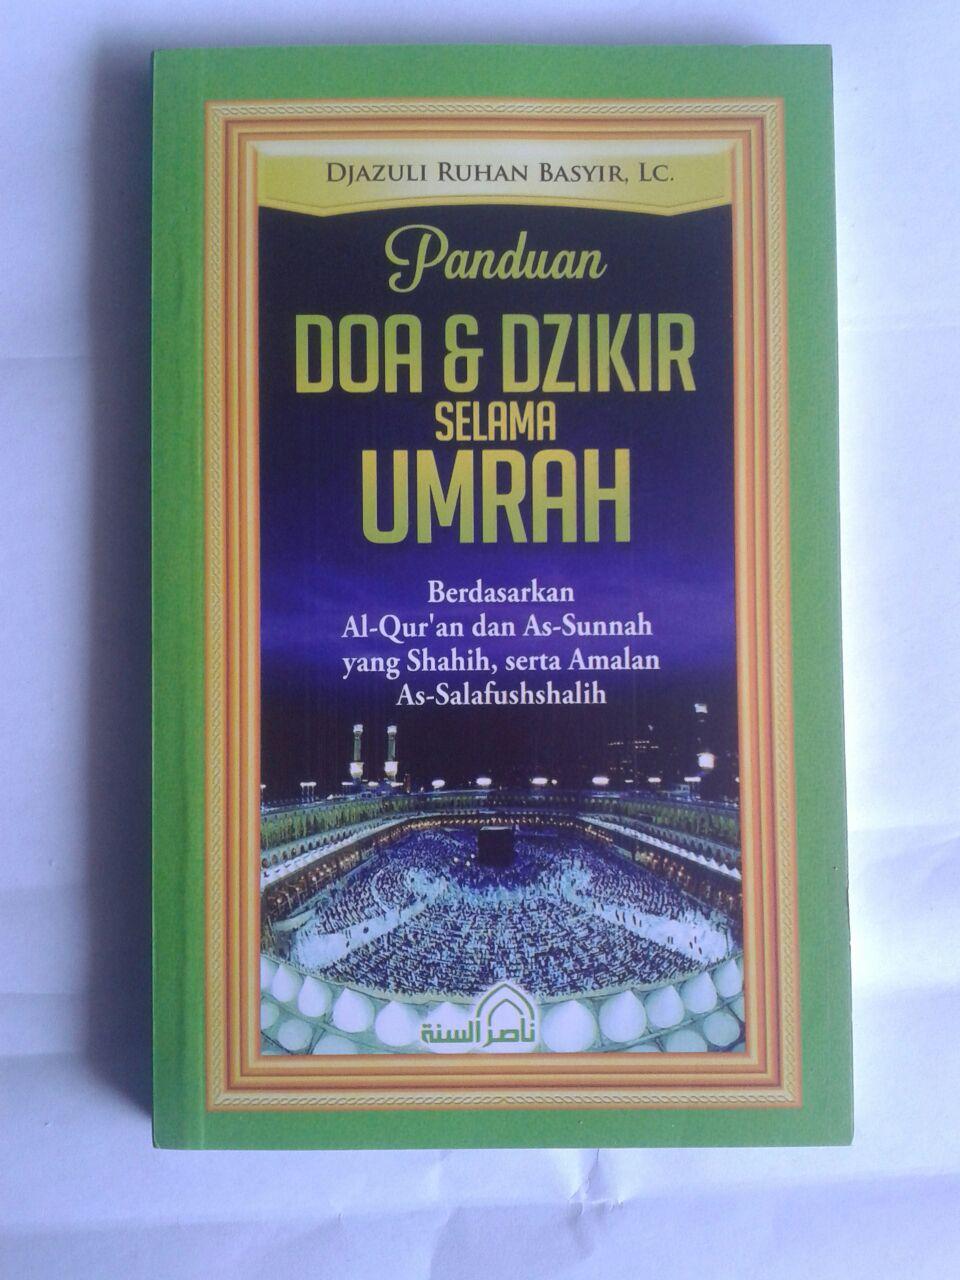 Buku Panduan Doa Dan Dzikir Selama Umrah cover 2